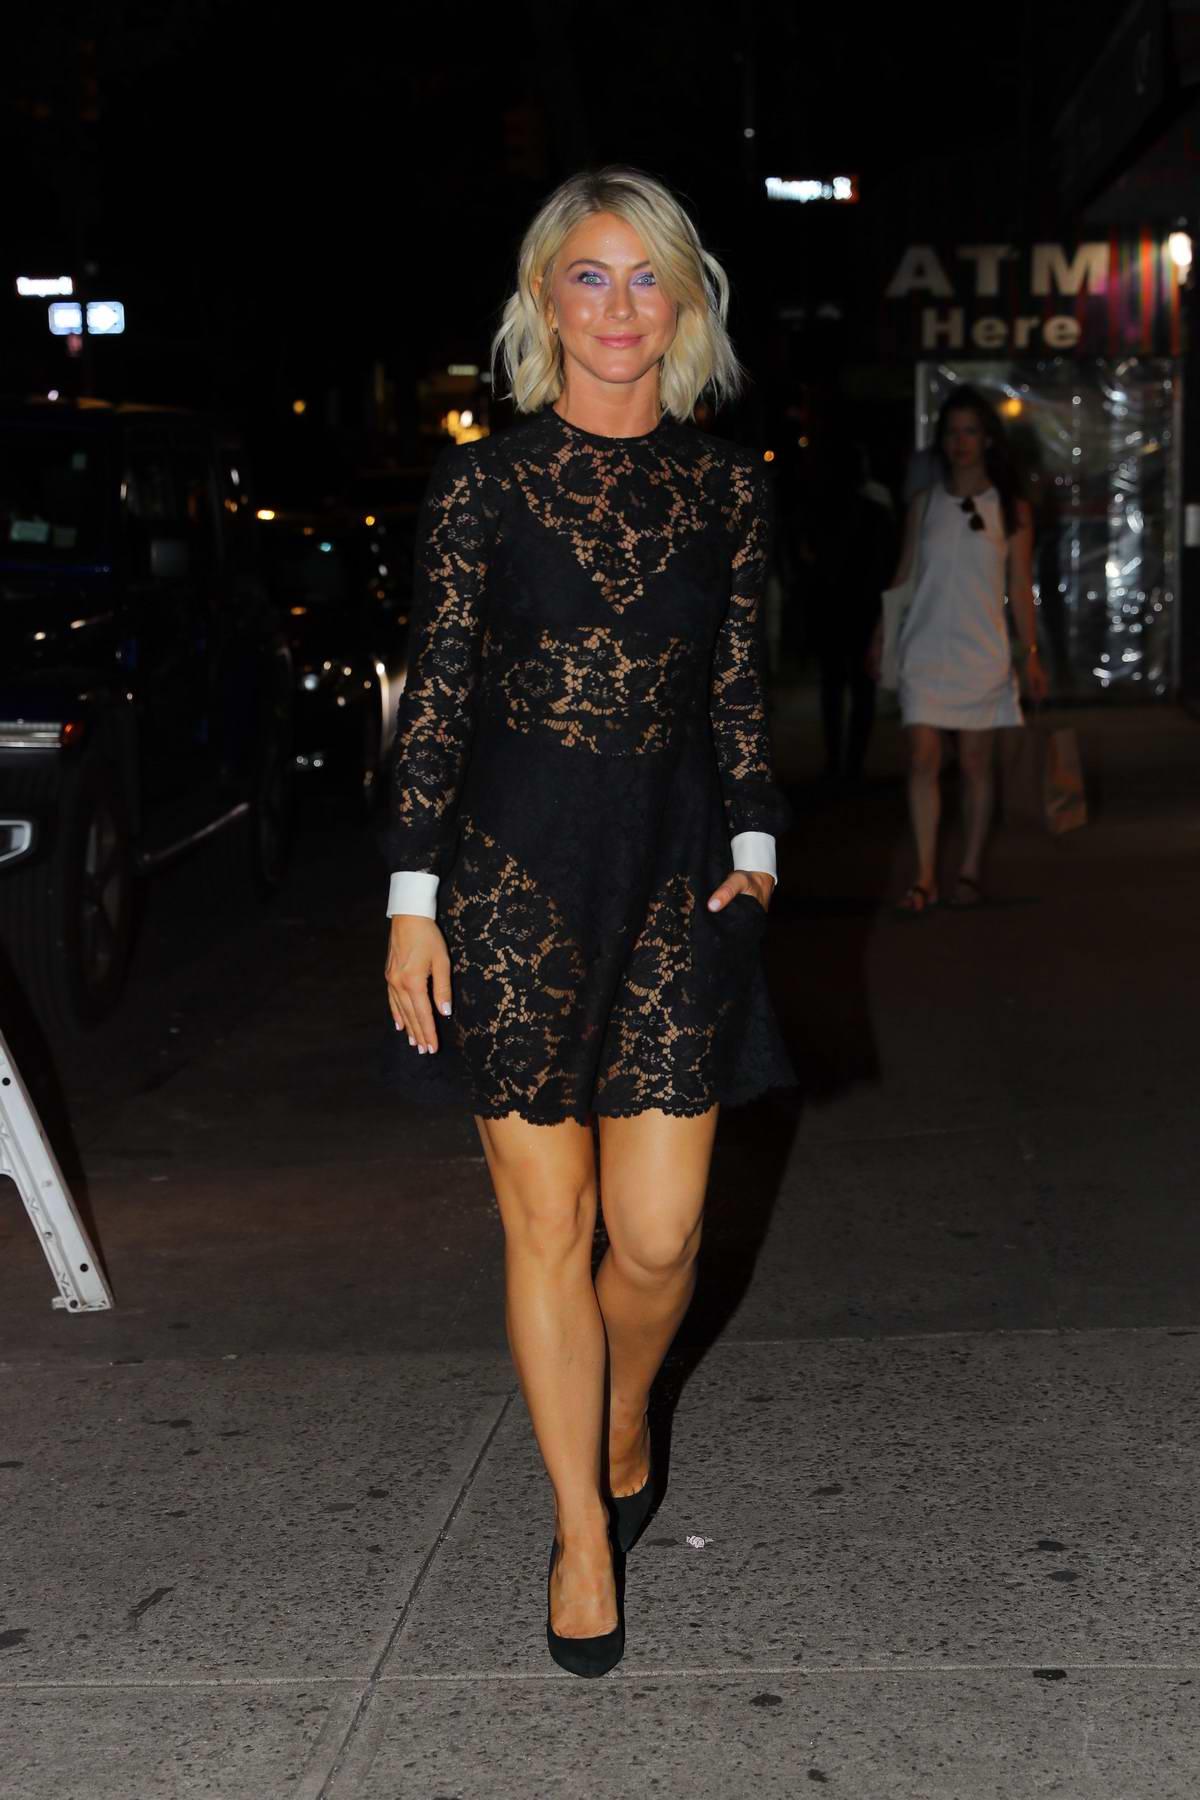 Julianne Hough dons a sheer black dress for dinner at Raul's in New York City